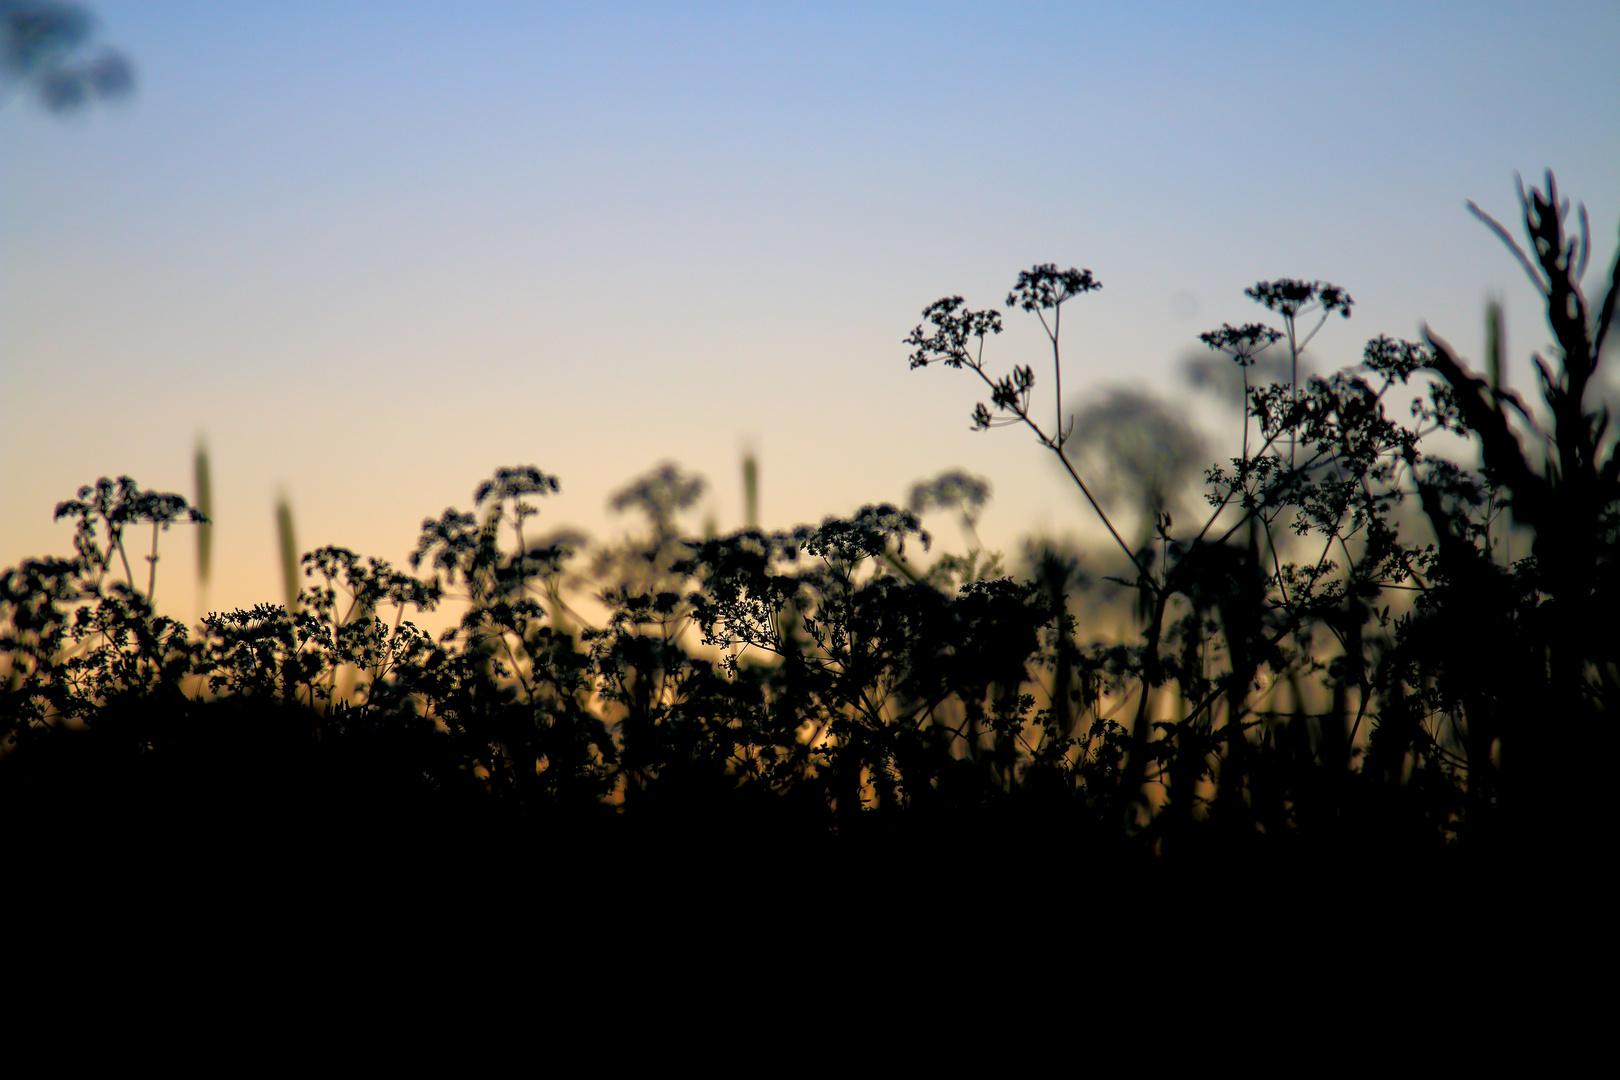 Gräser nach dem Sonnenuntergang